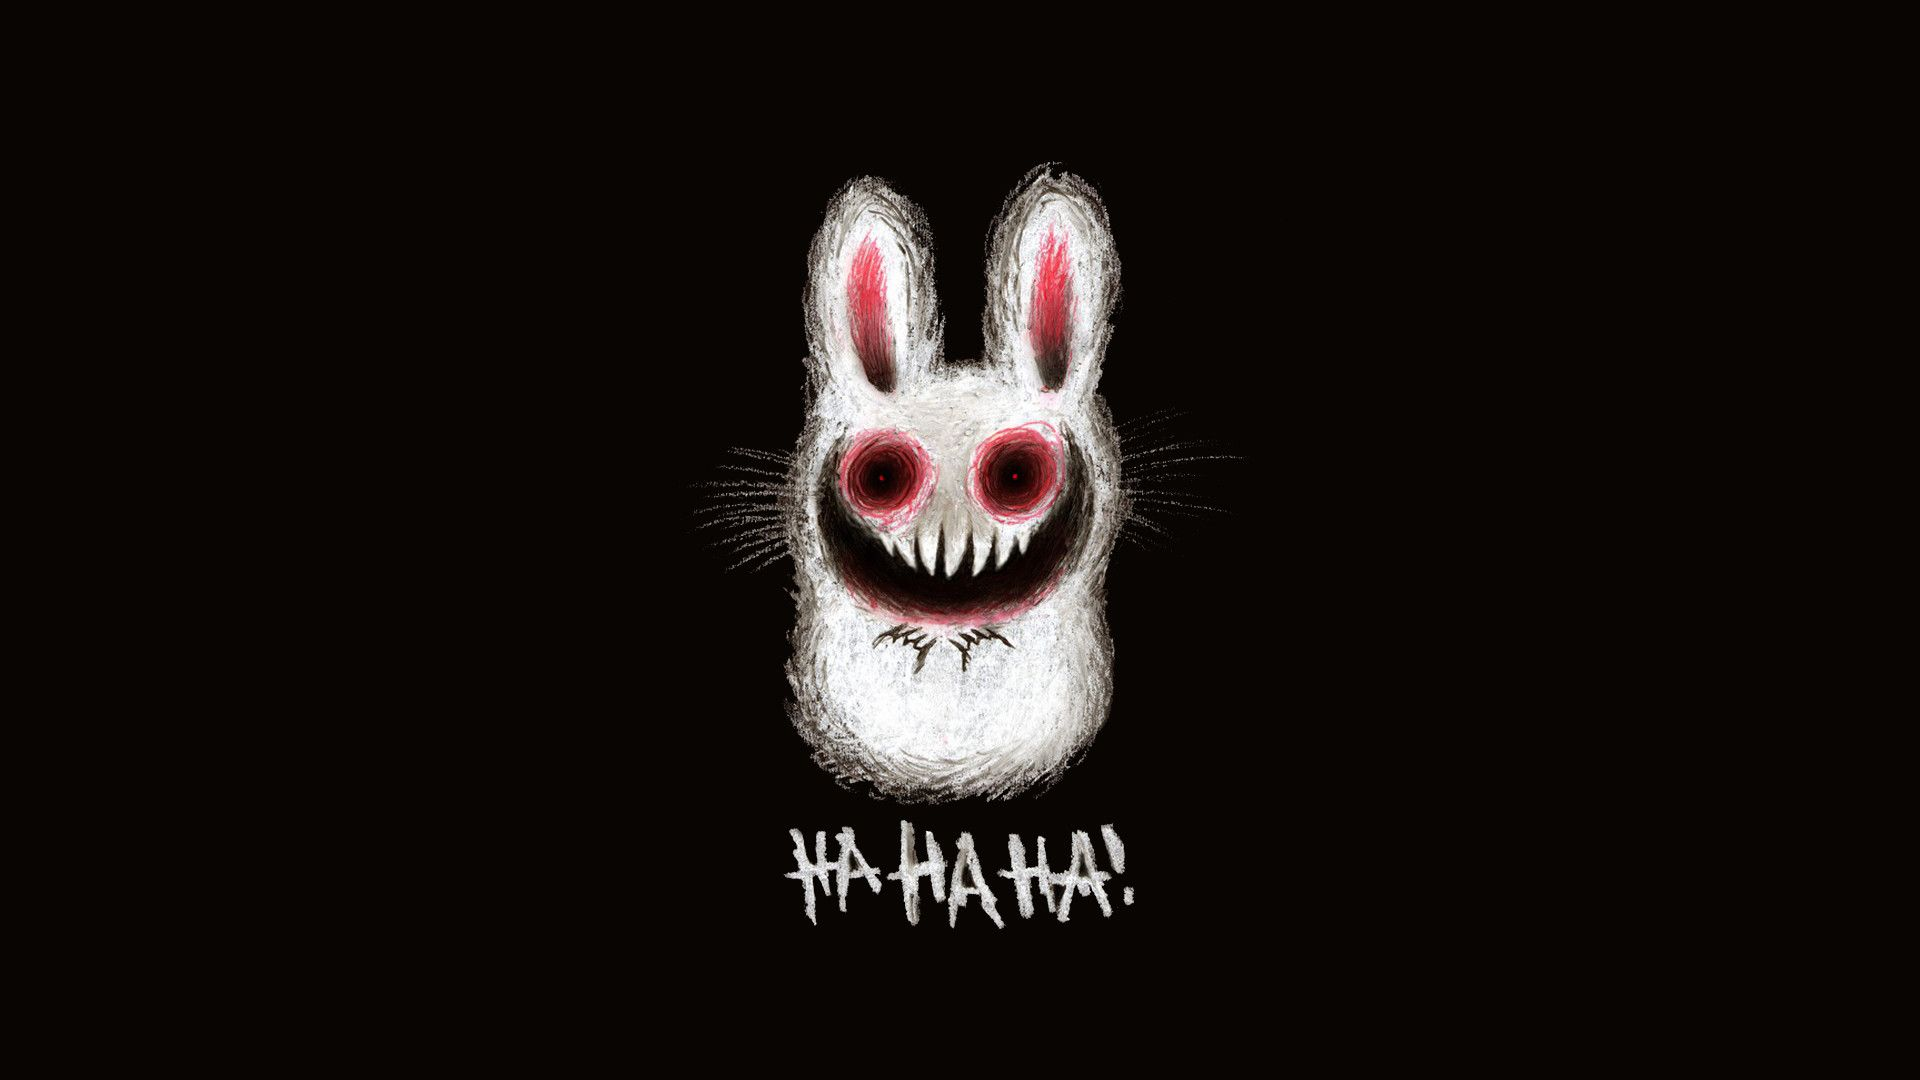 Free Download 1920x1080 Creepy Bunny Wallpaper Cute Adorable